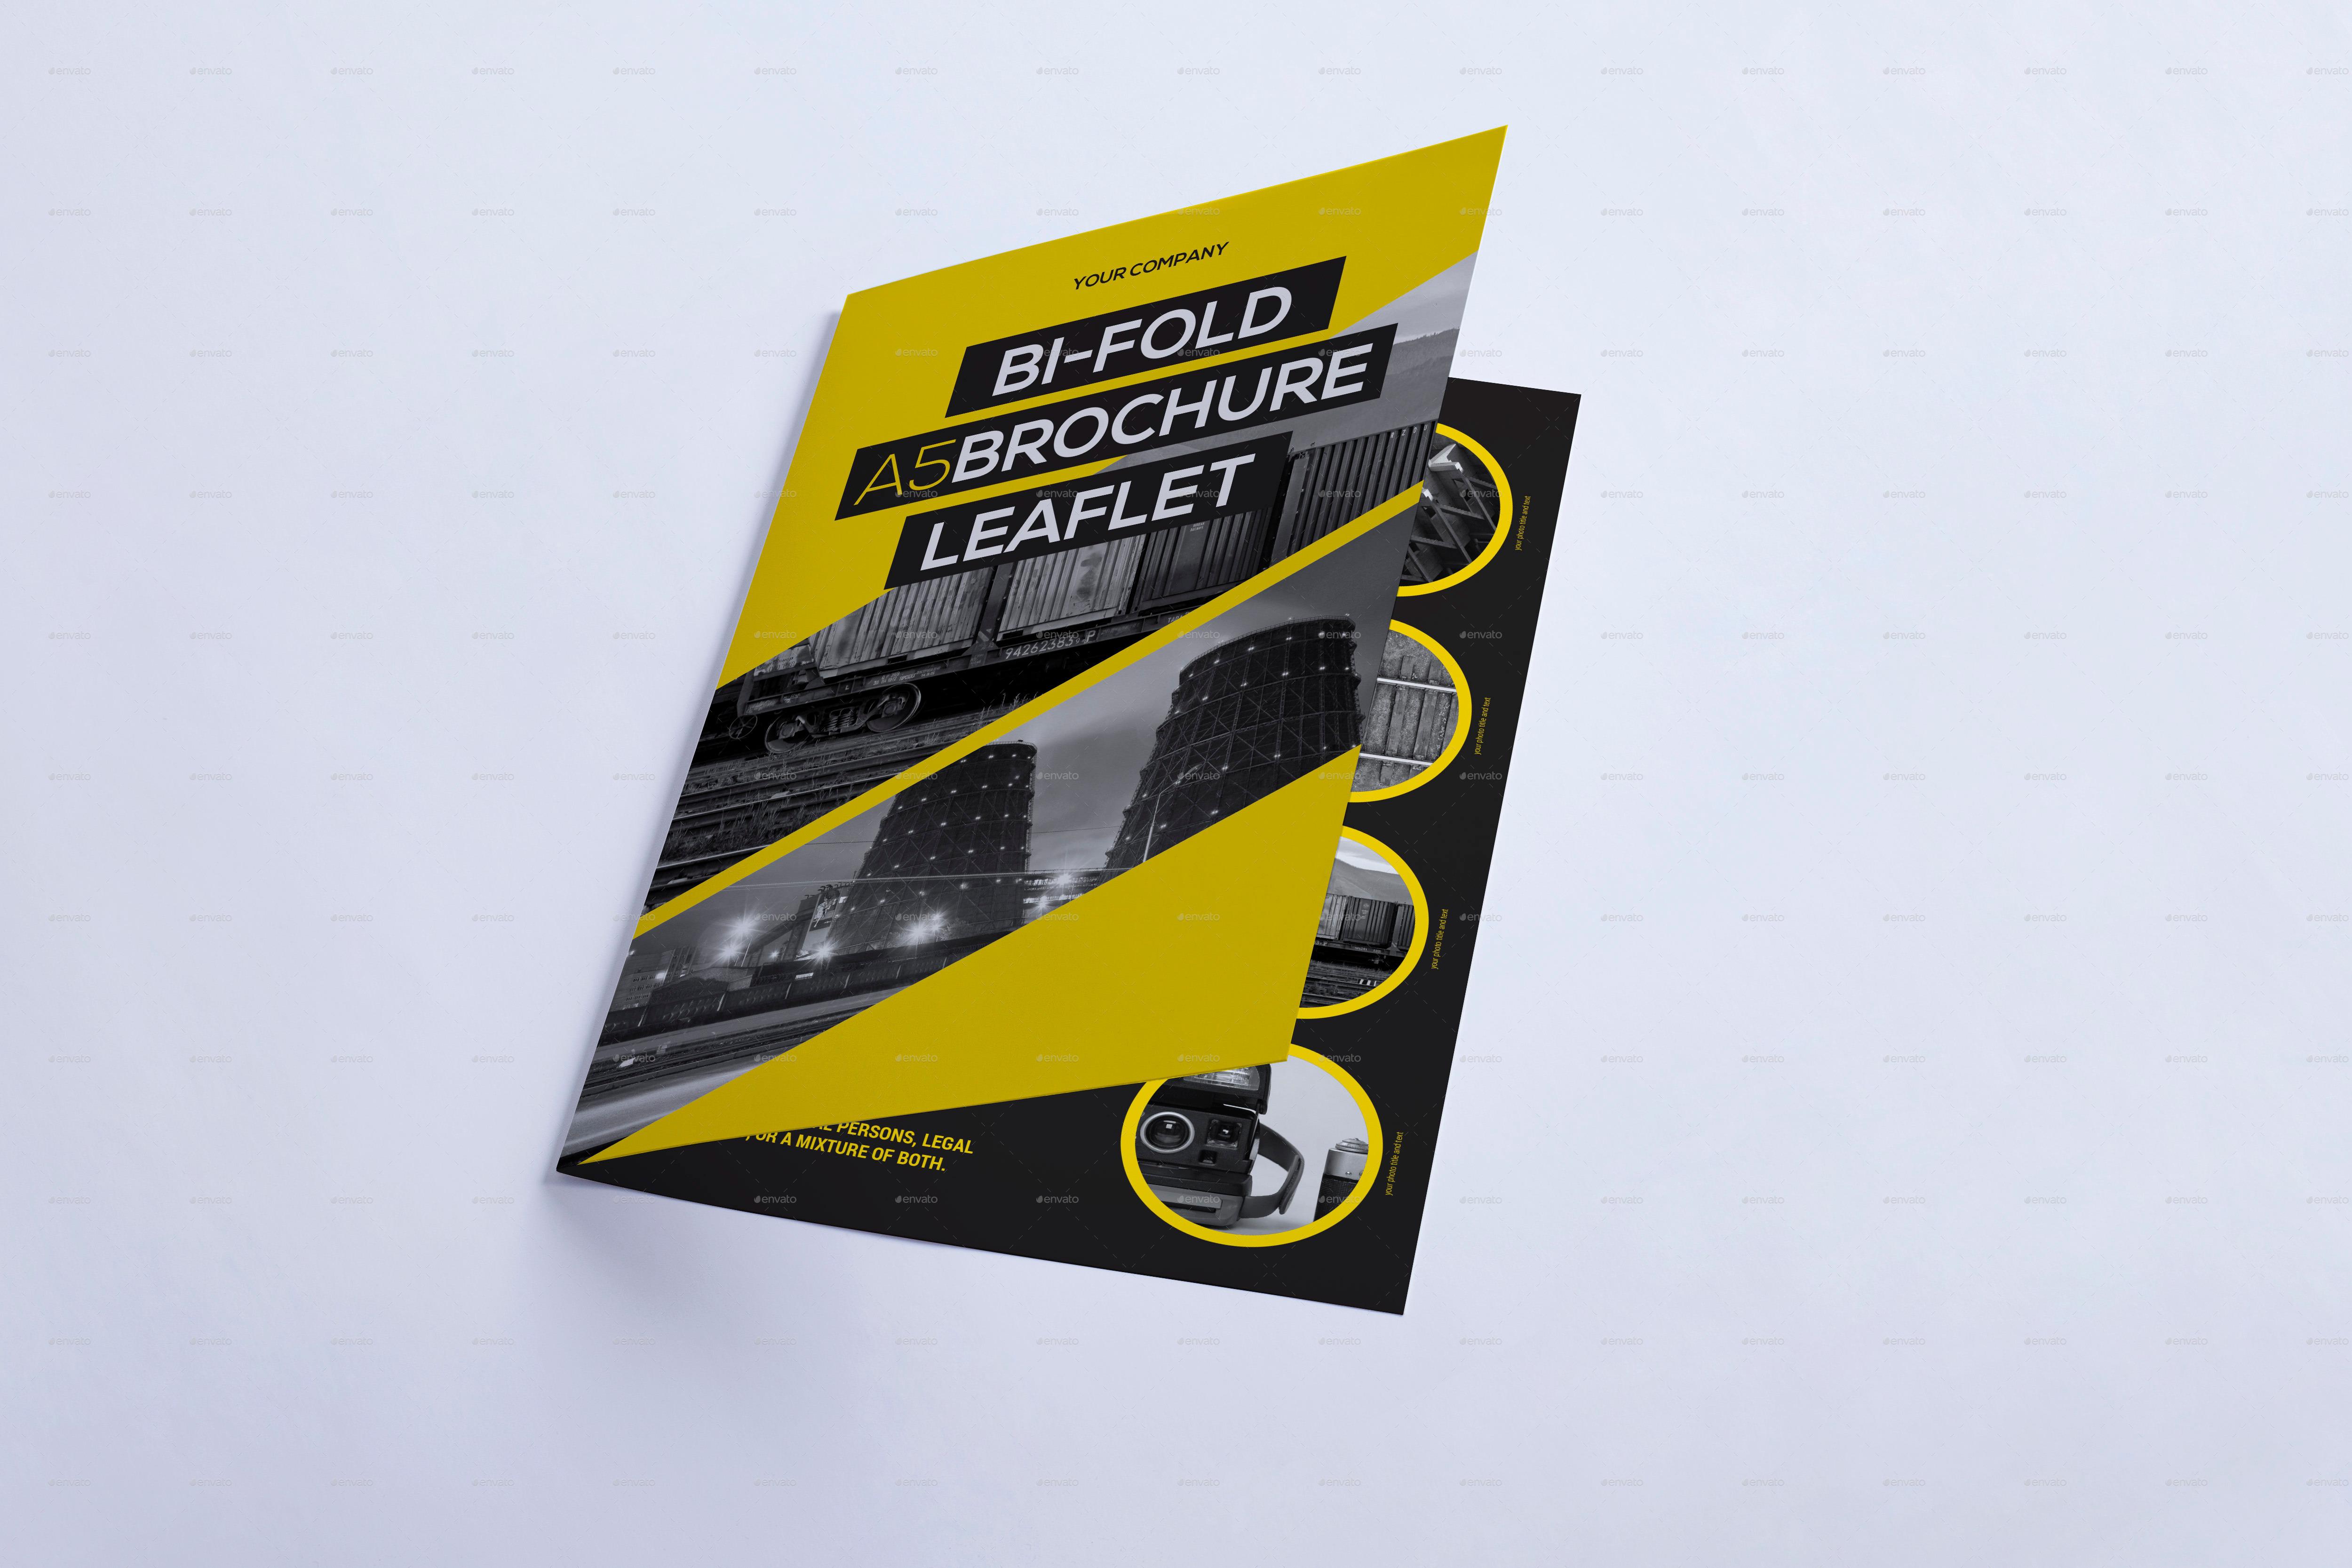 bi-fold a5 brochure